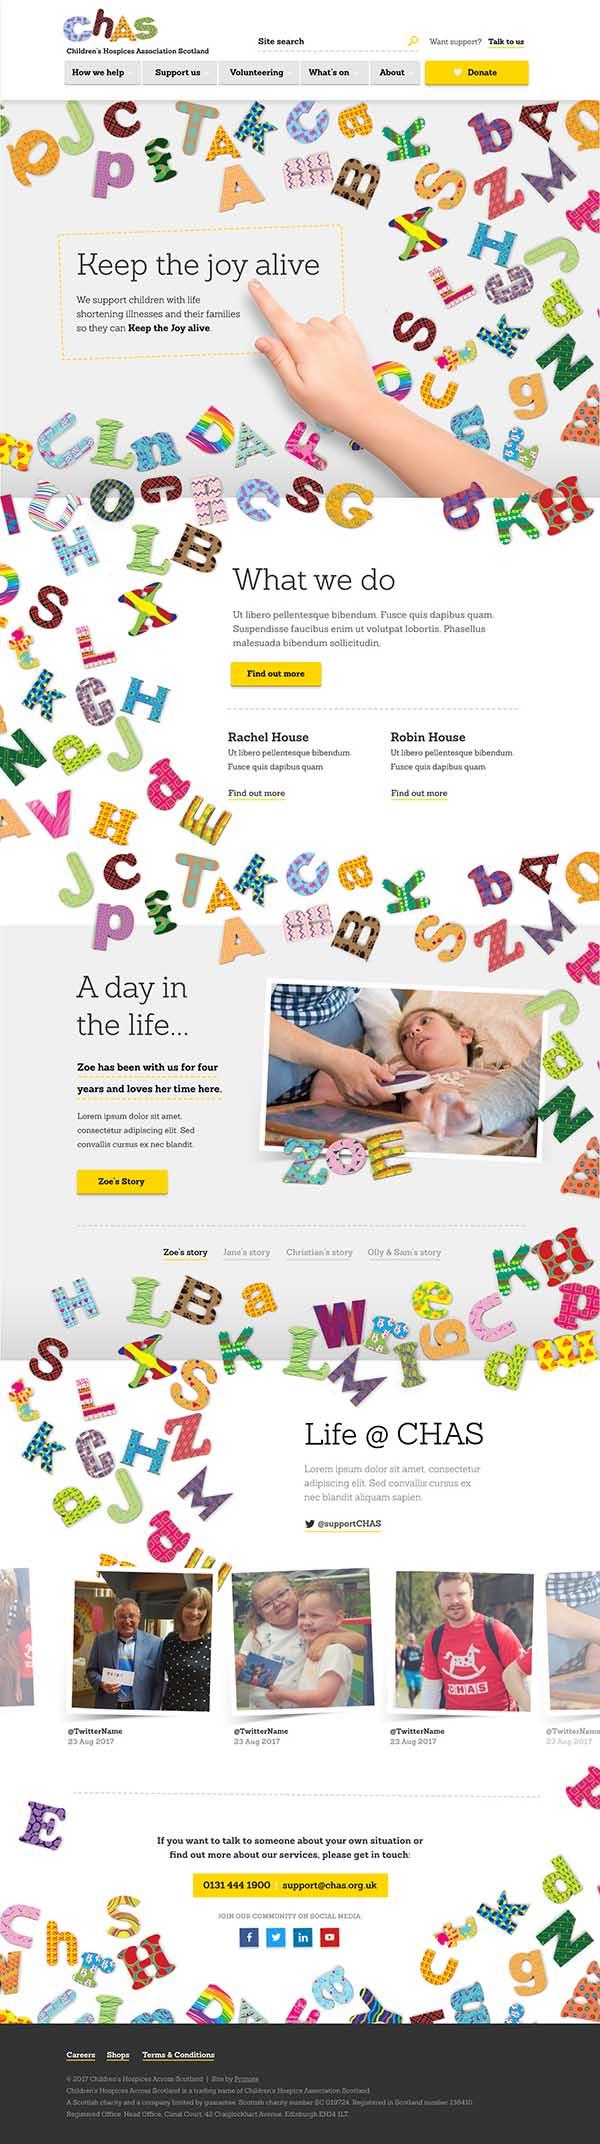 CHAS homepage